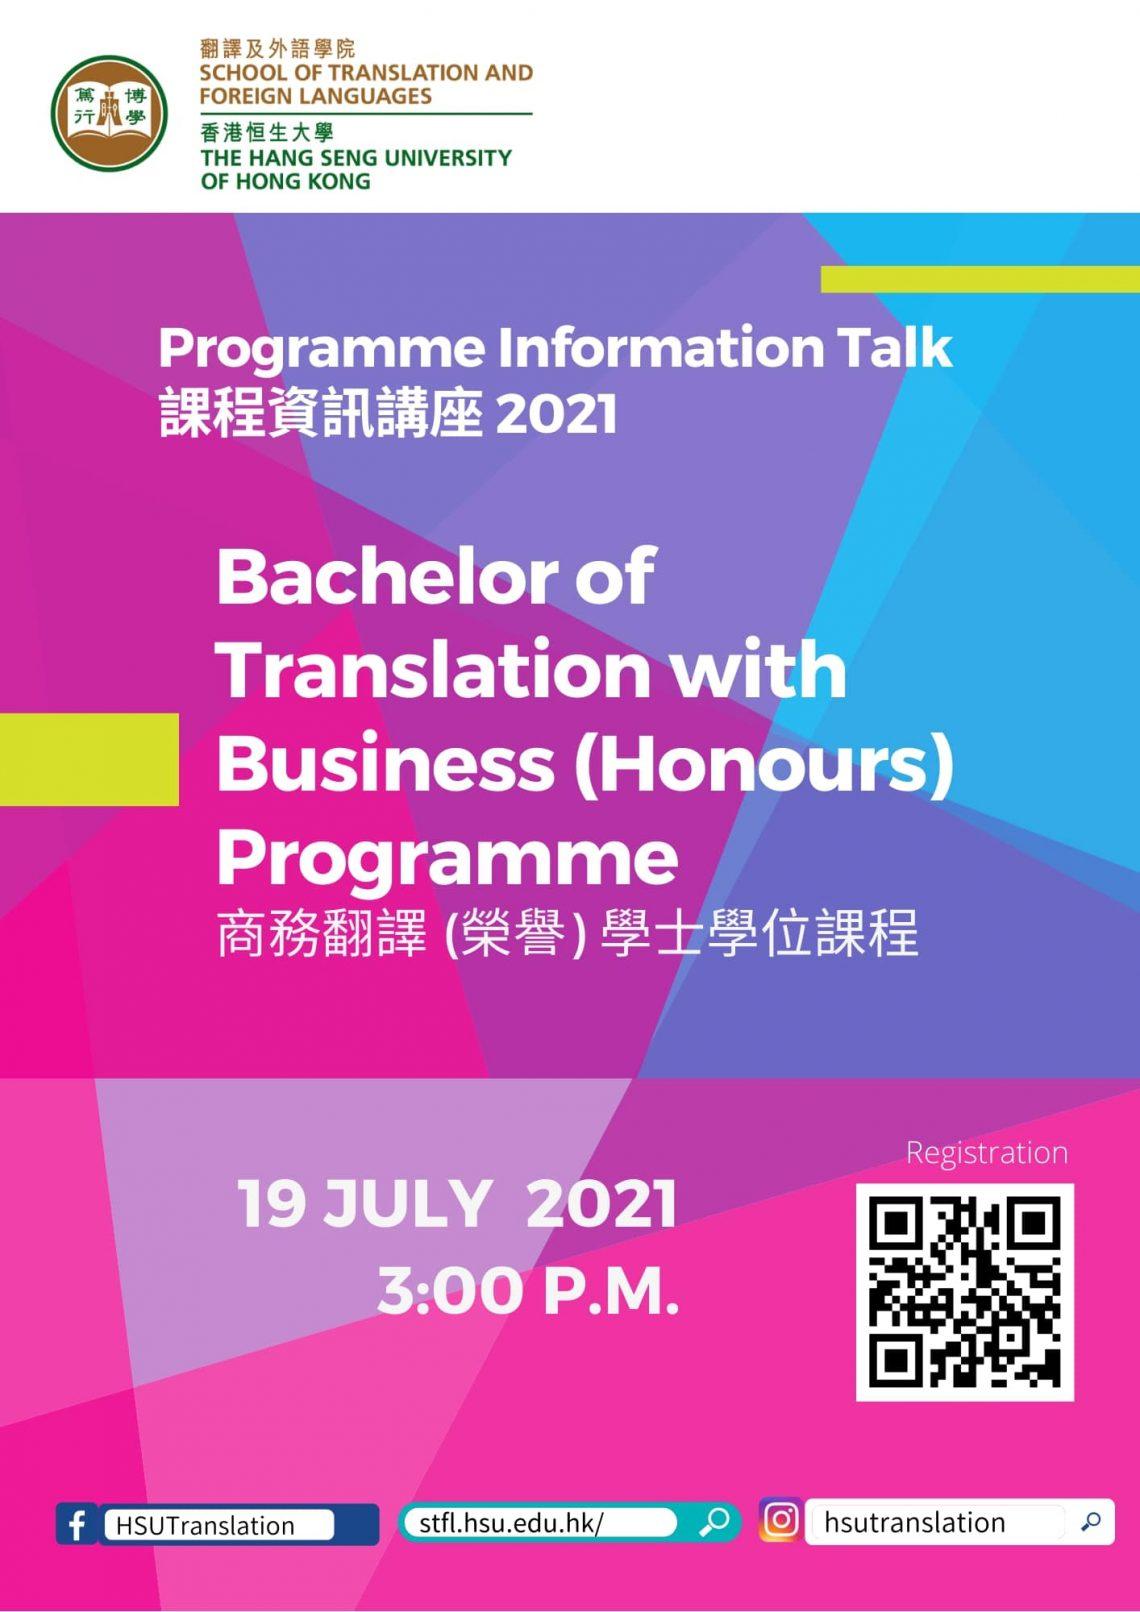 Programme Information Talk 2021: Bachelor of Translation with Business